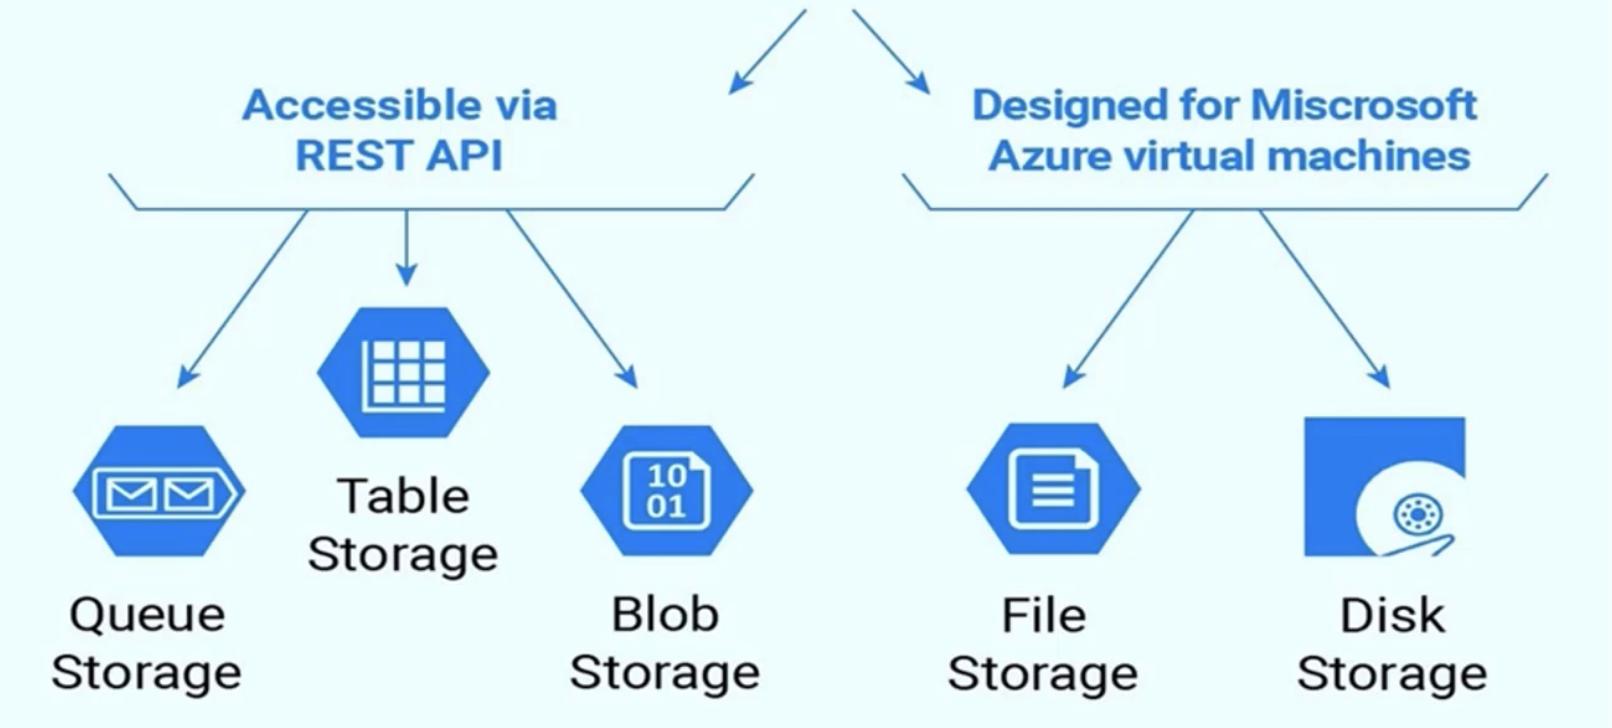 az-storage-types-1612x728